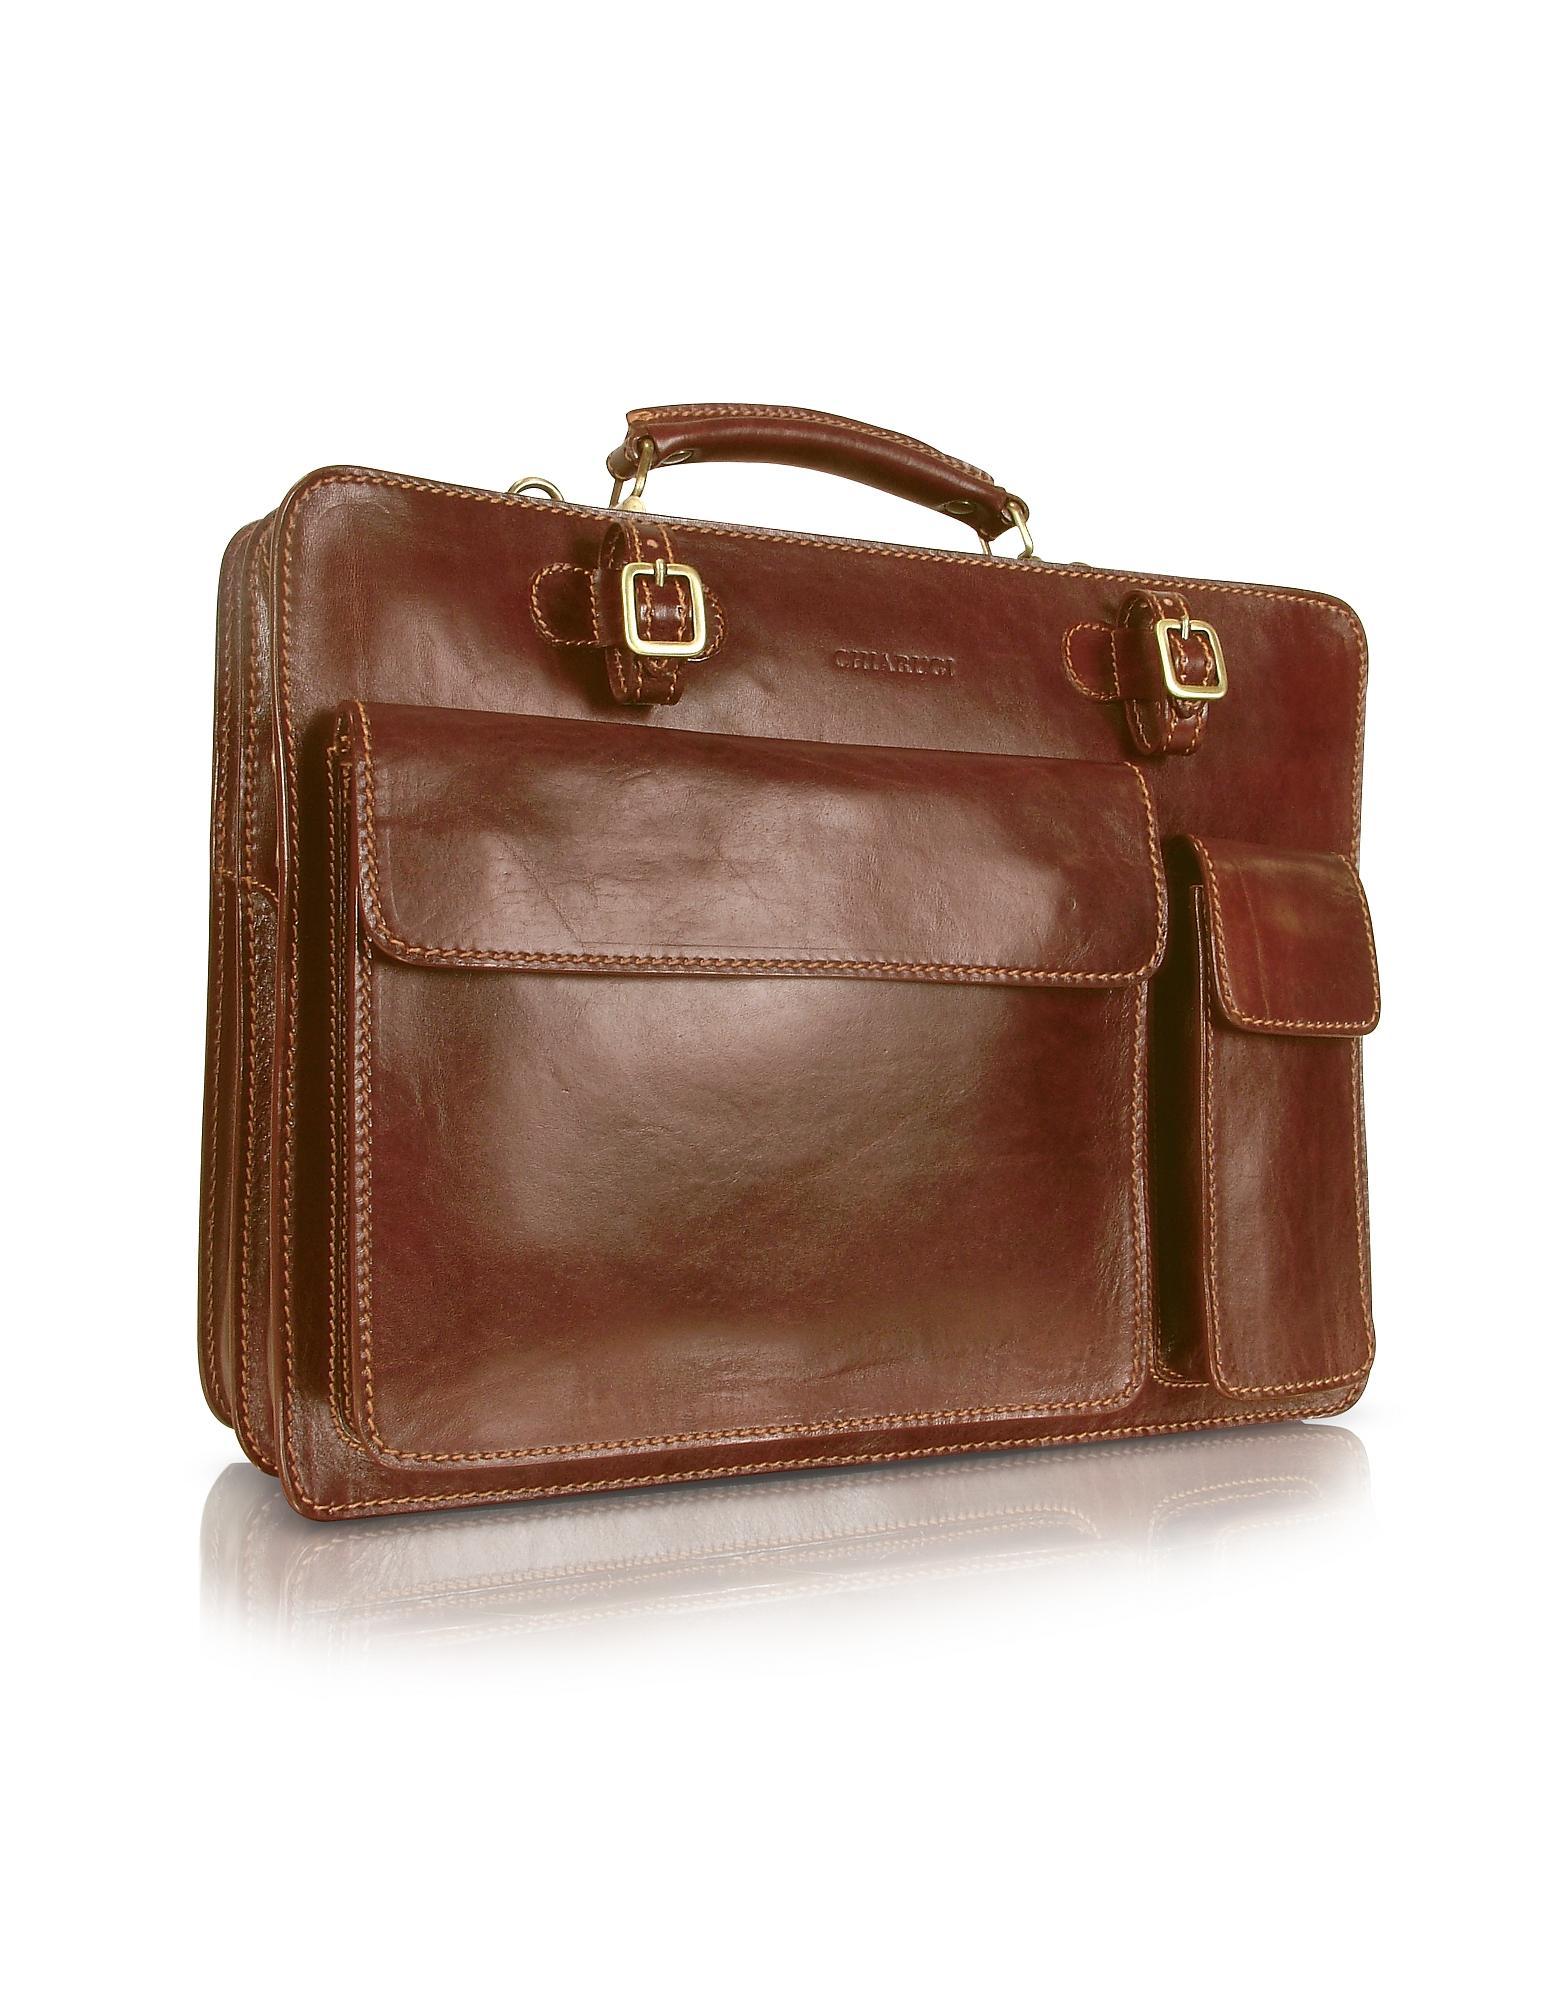 1b021930aa8bc Lyst - Chiarugi Handmade Brown Genuine Leather Double Gusset ...